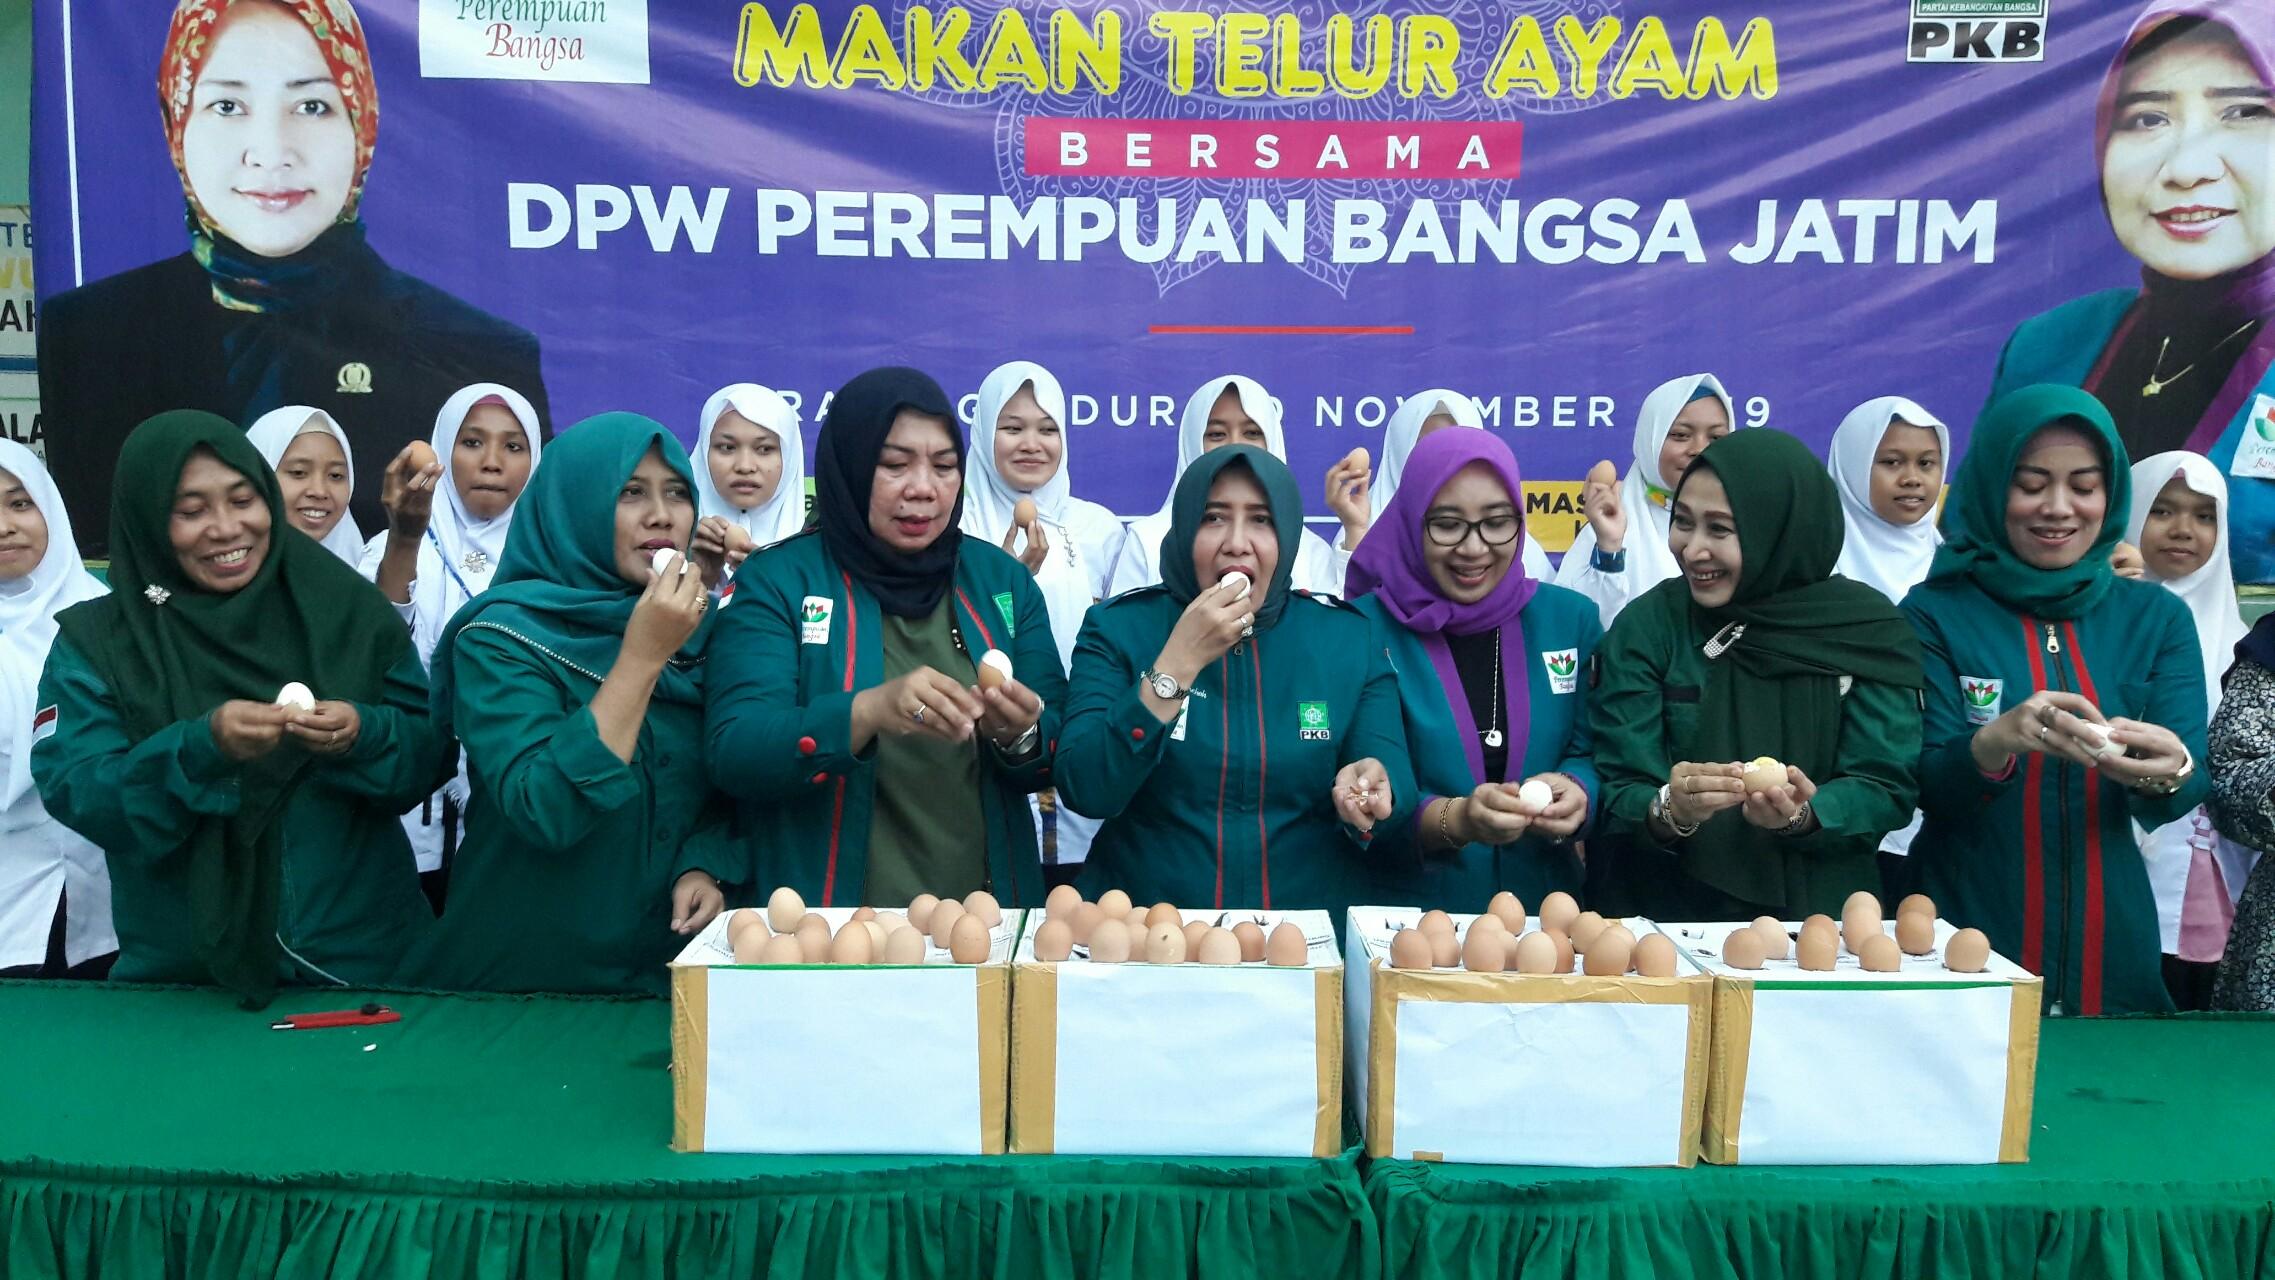 Tepis Isu Telur Jatim Mengandung Dioxin, Perempuan Bangsa Jatim Gelar Makan Telur Bersama